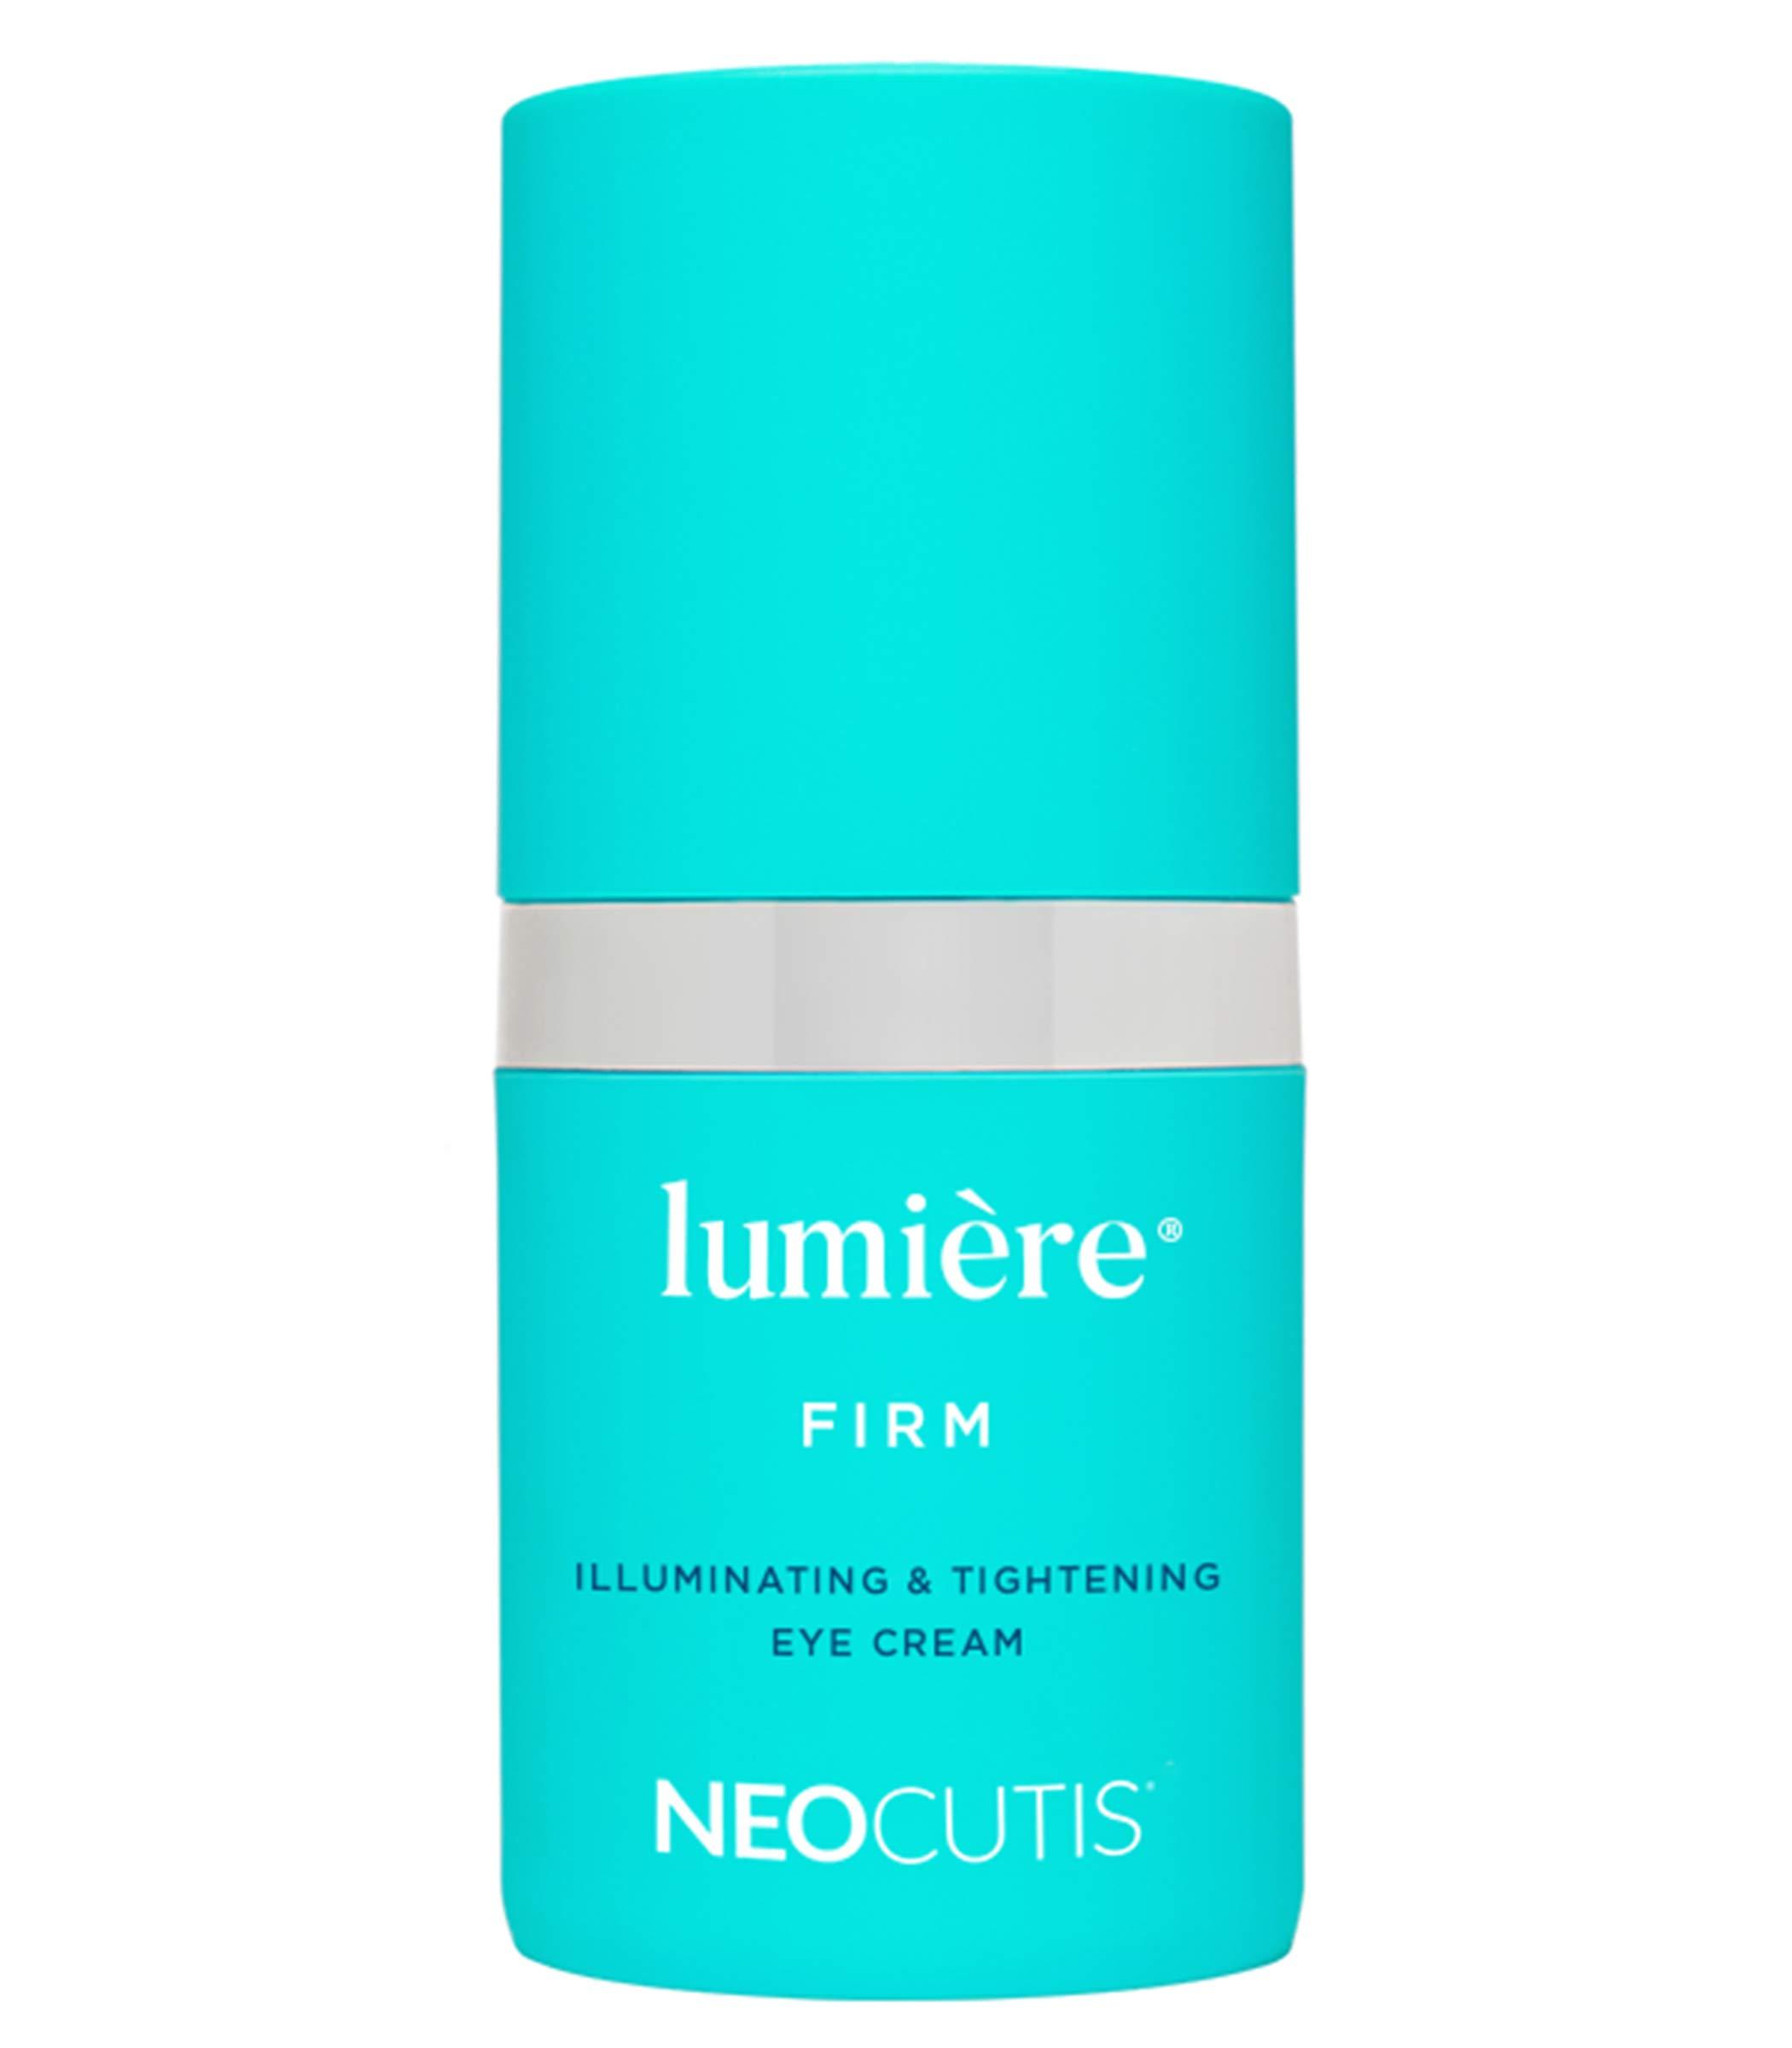 Neocutis Lumière Firm Illuminating and Tightening Eye Cream - 15mL